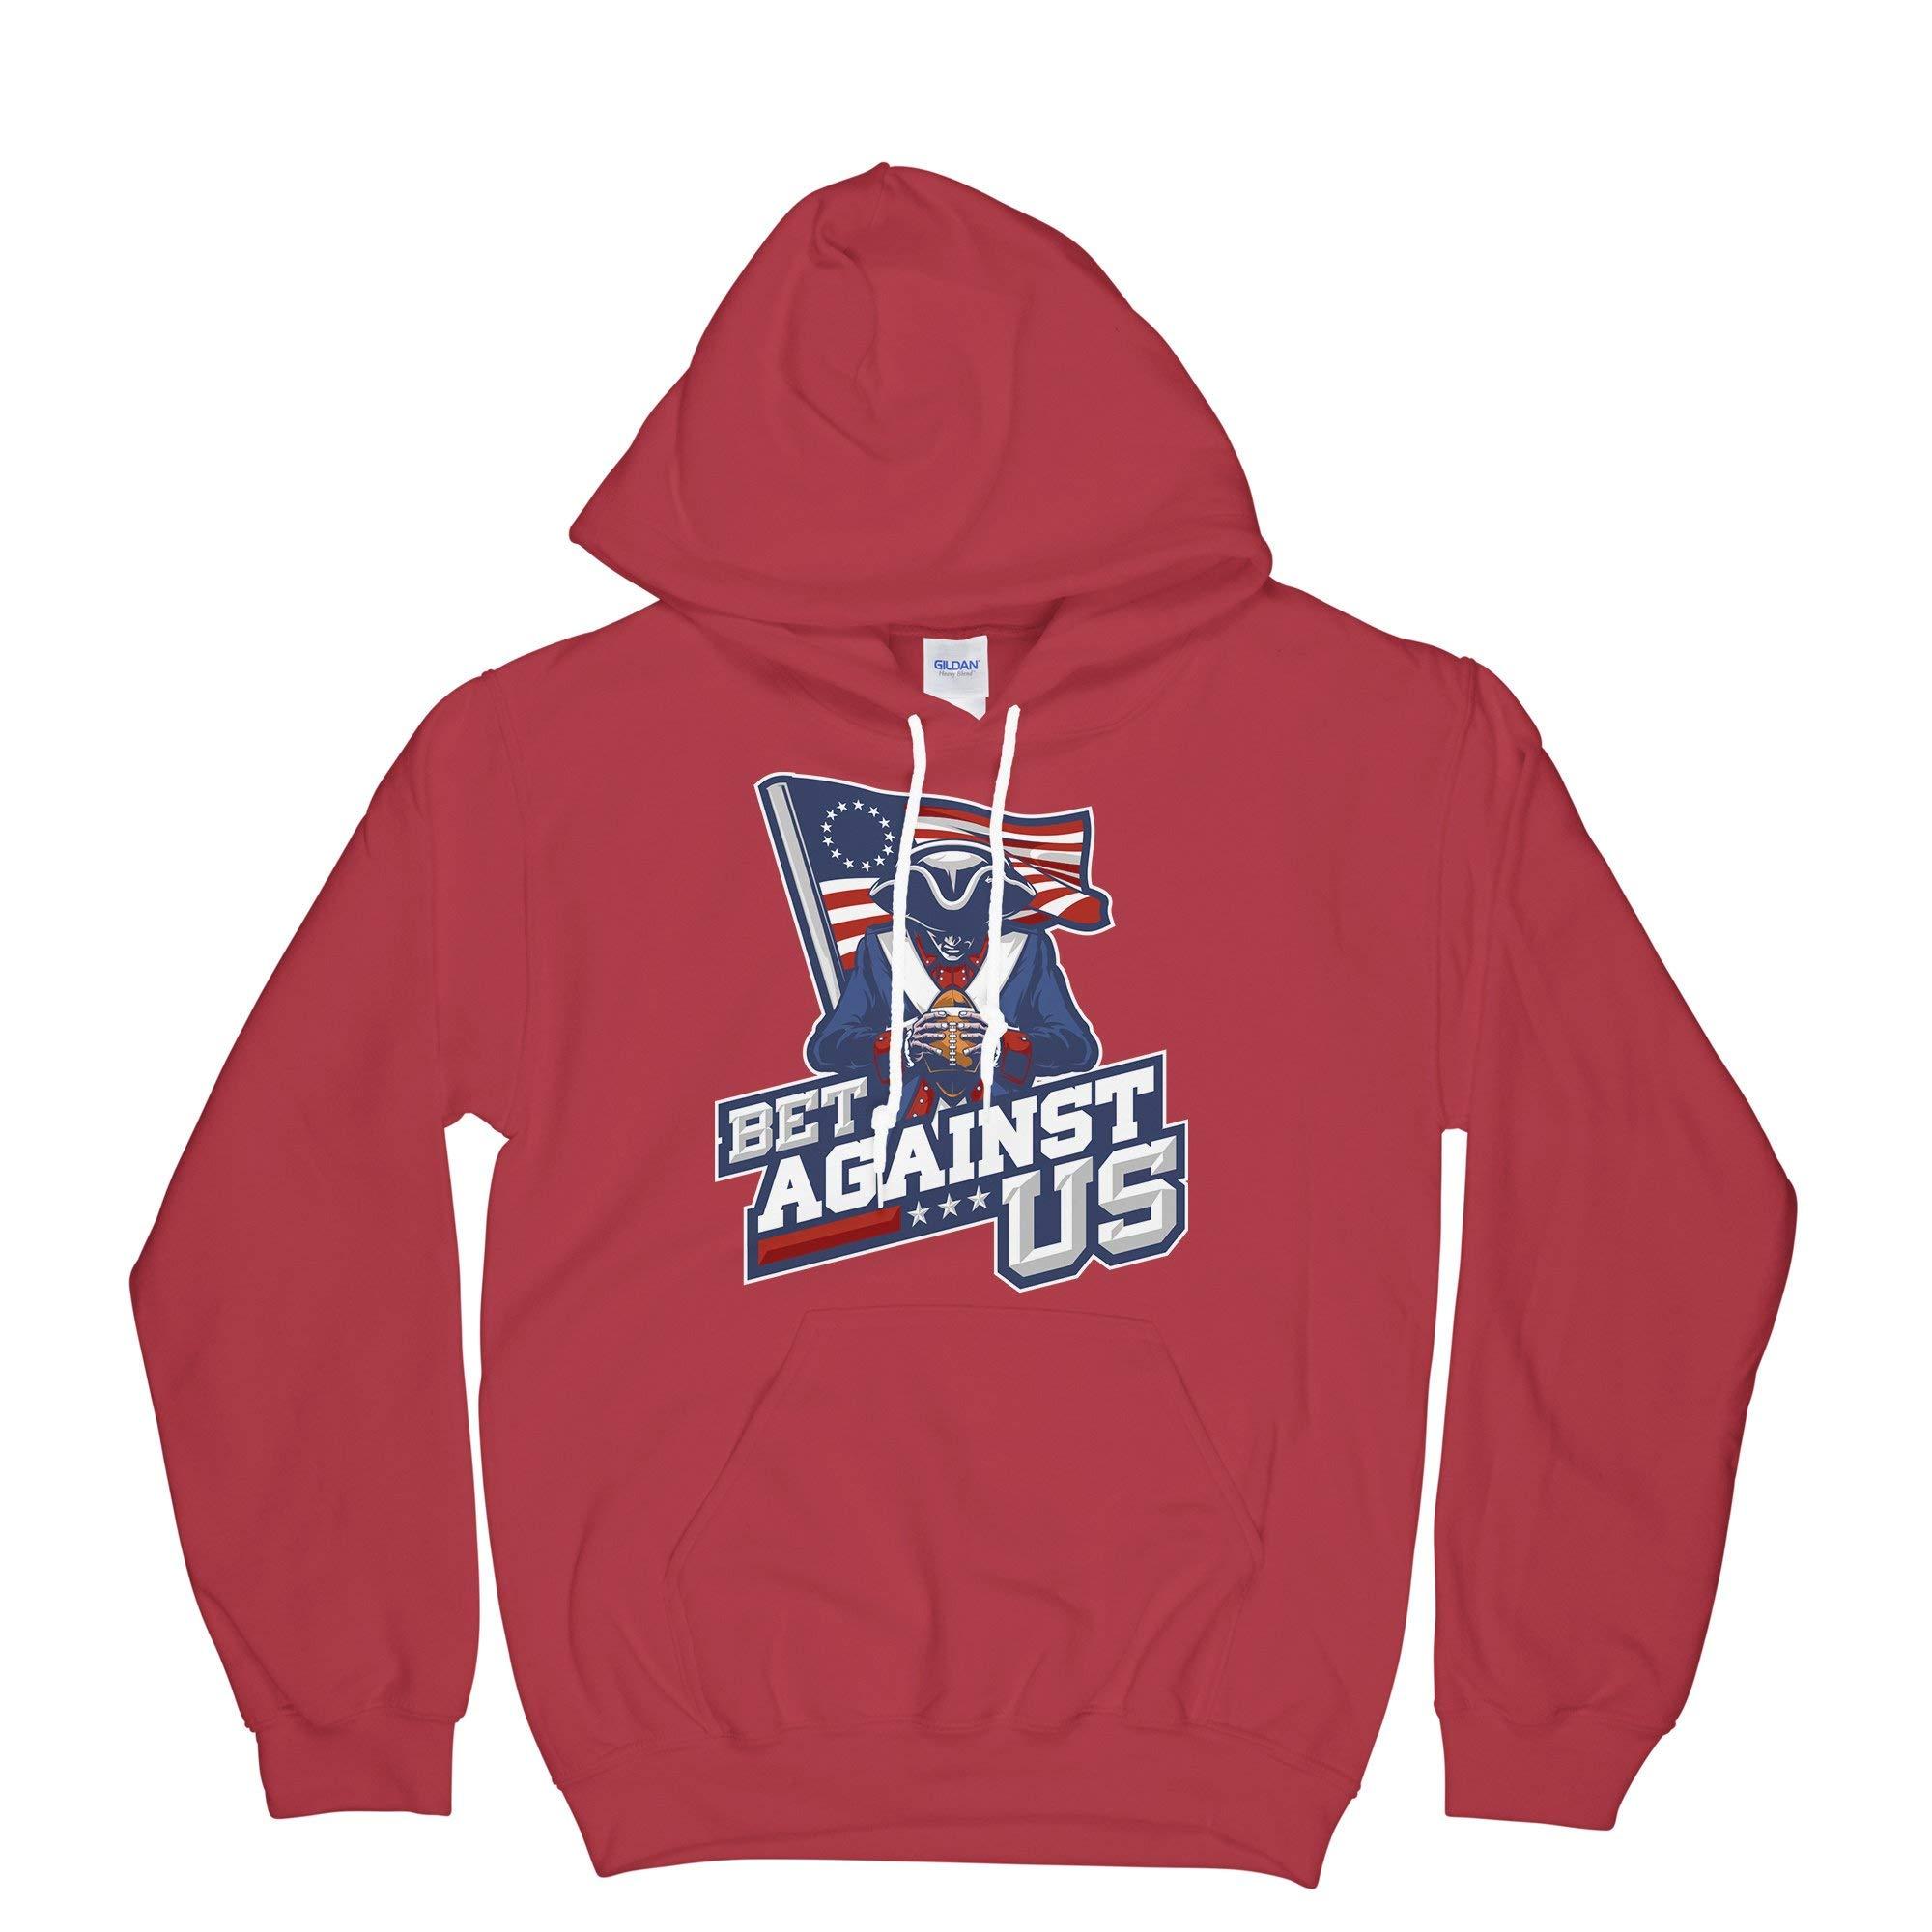 Patriots Shirt Bet Against Us Fan Art Gameday Gift